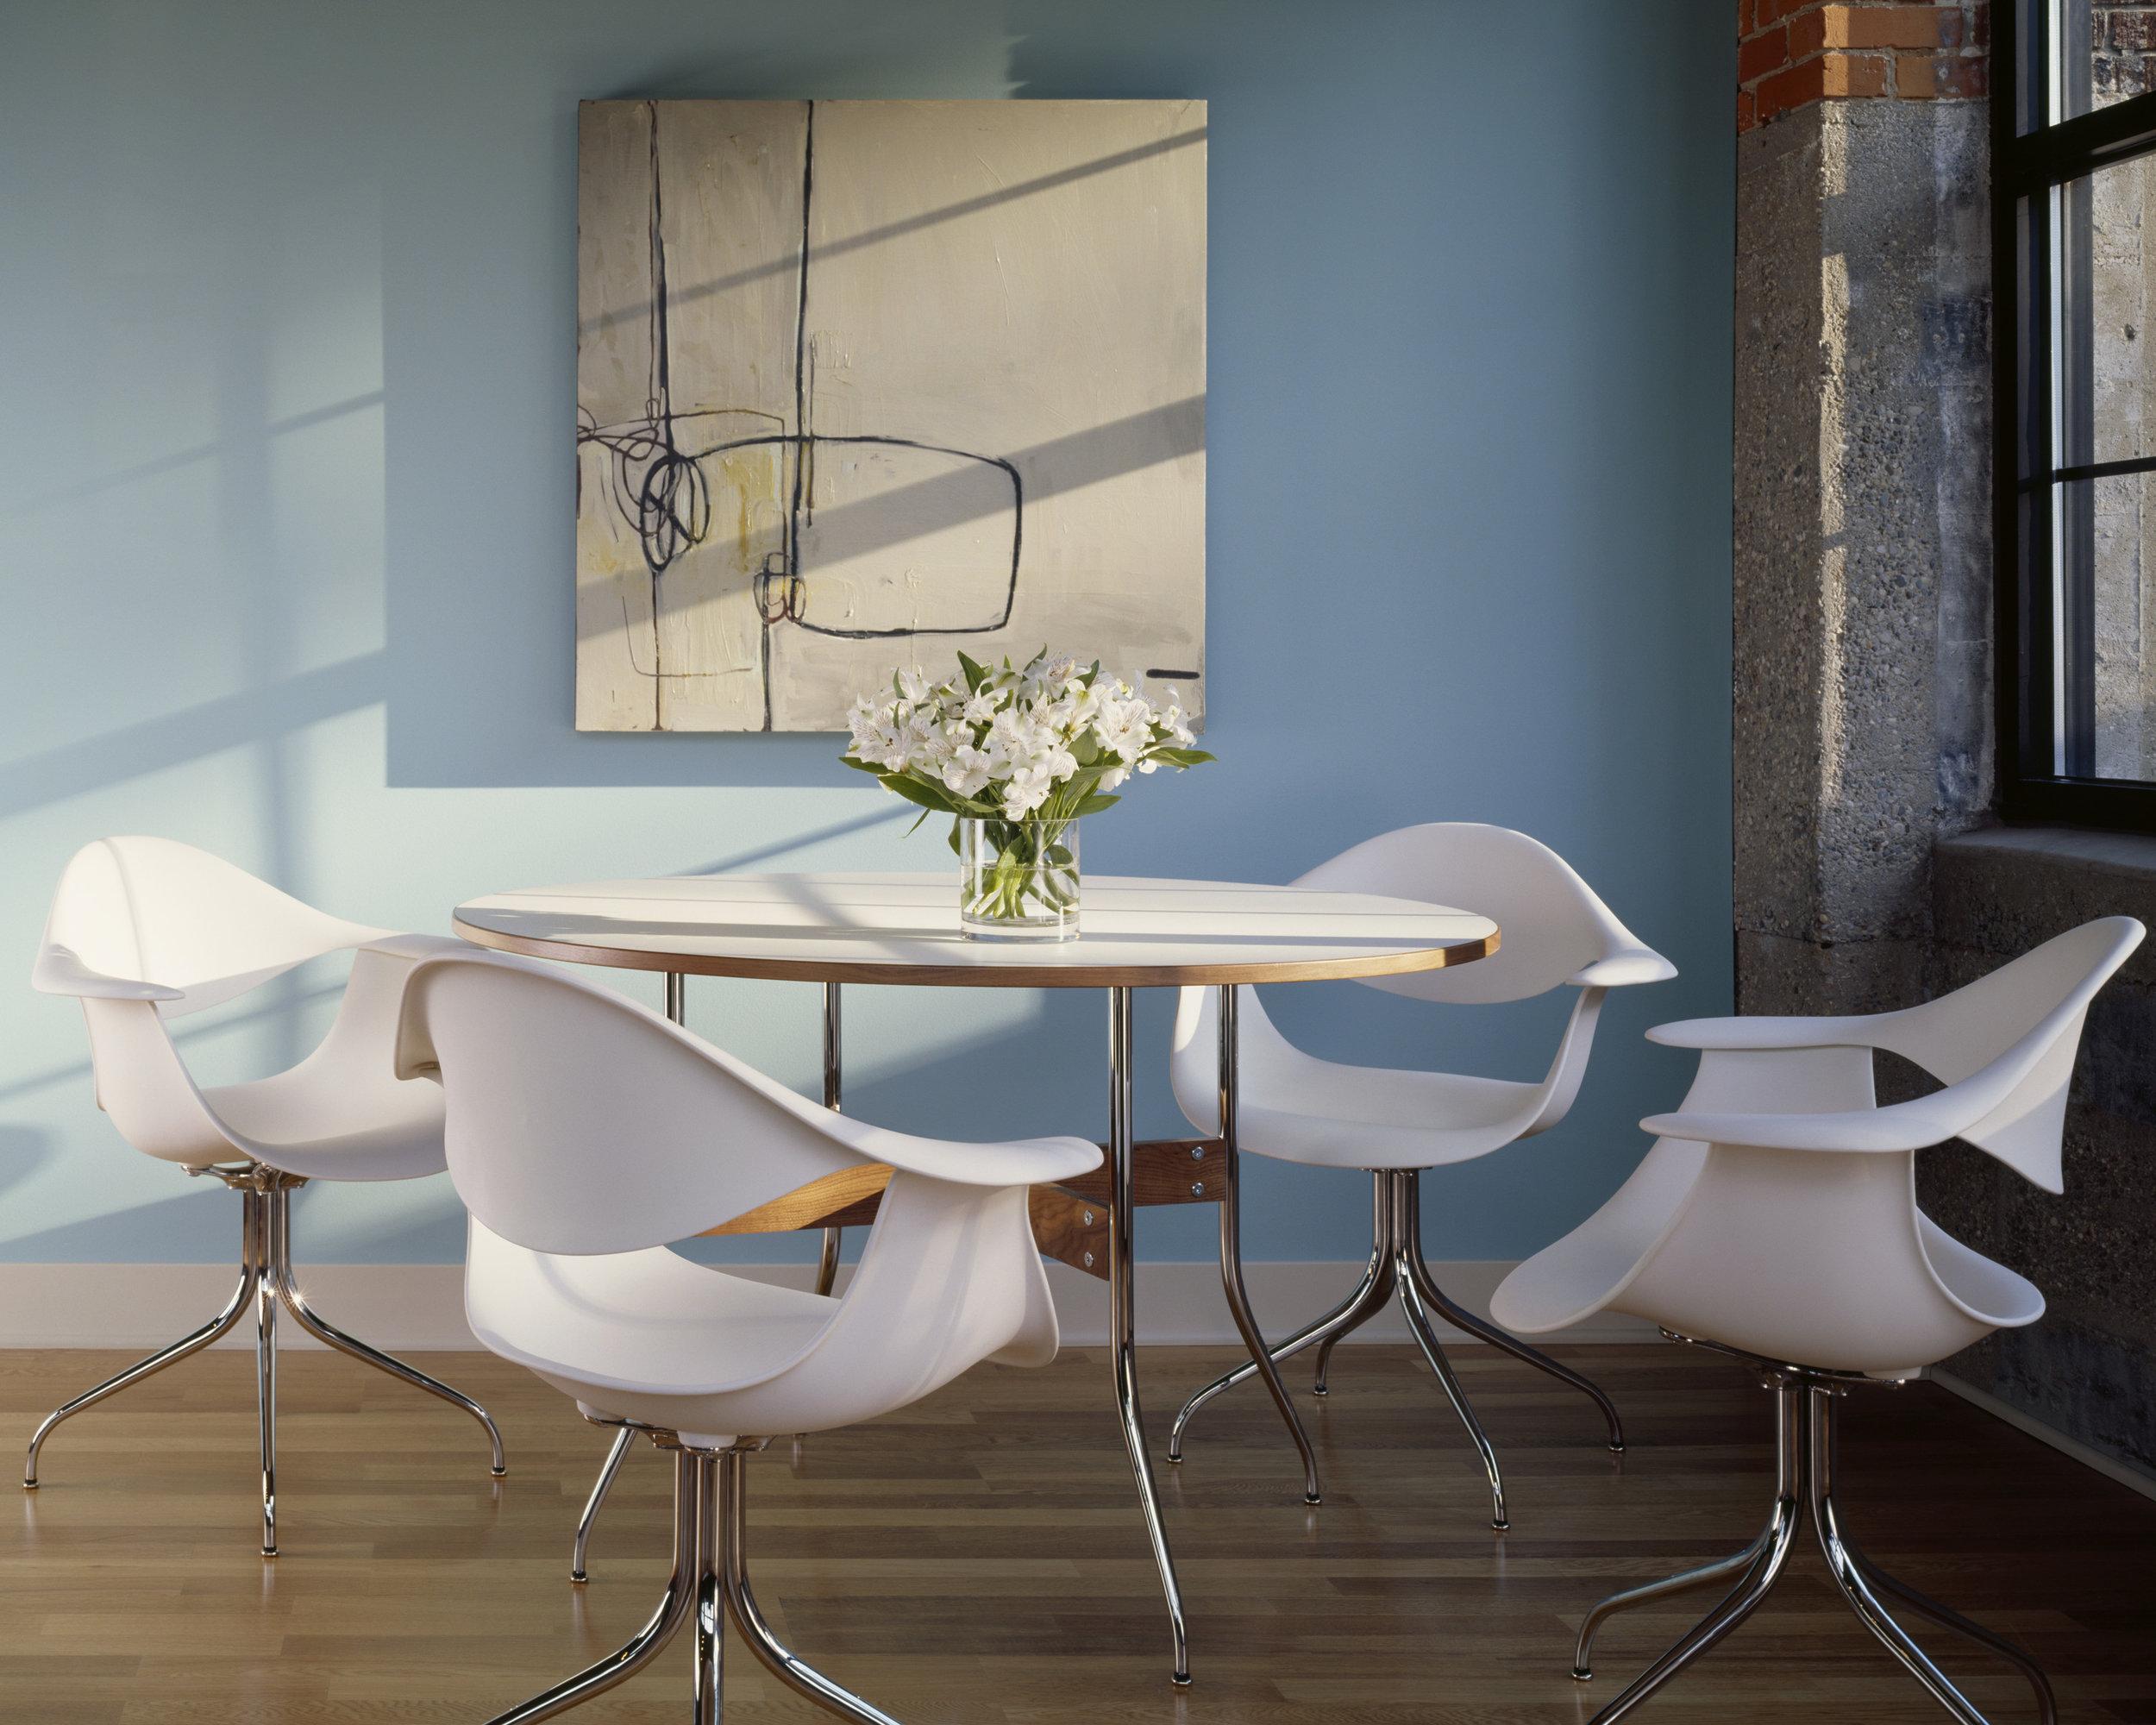 Name : Nelson™ swag leg dining table & Nelson™ swag leg armchair / Designer :George Nelson